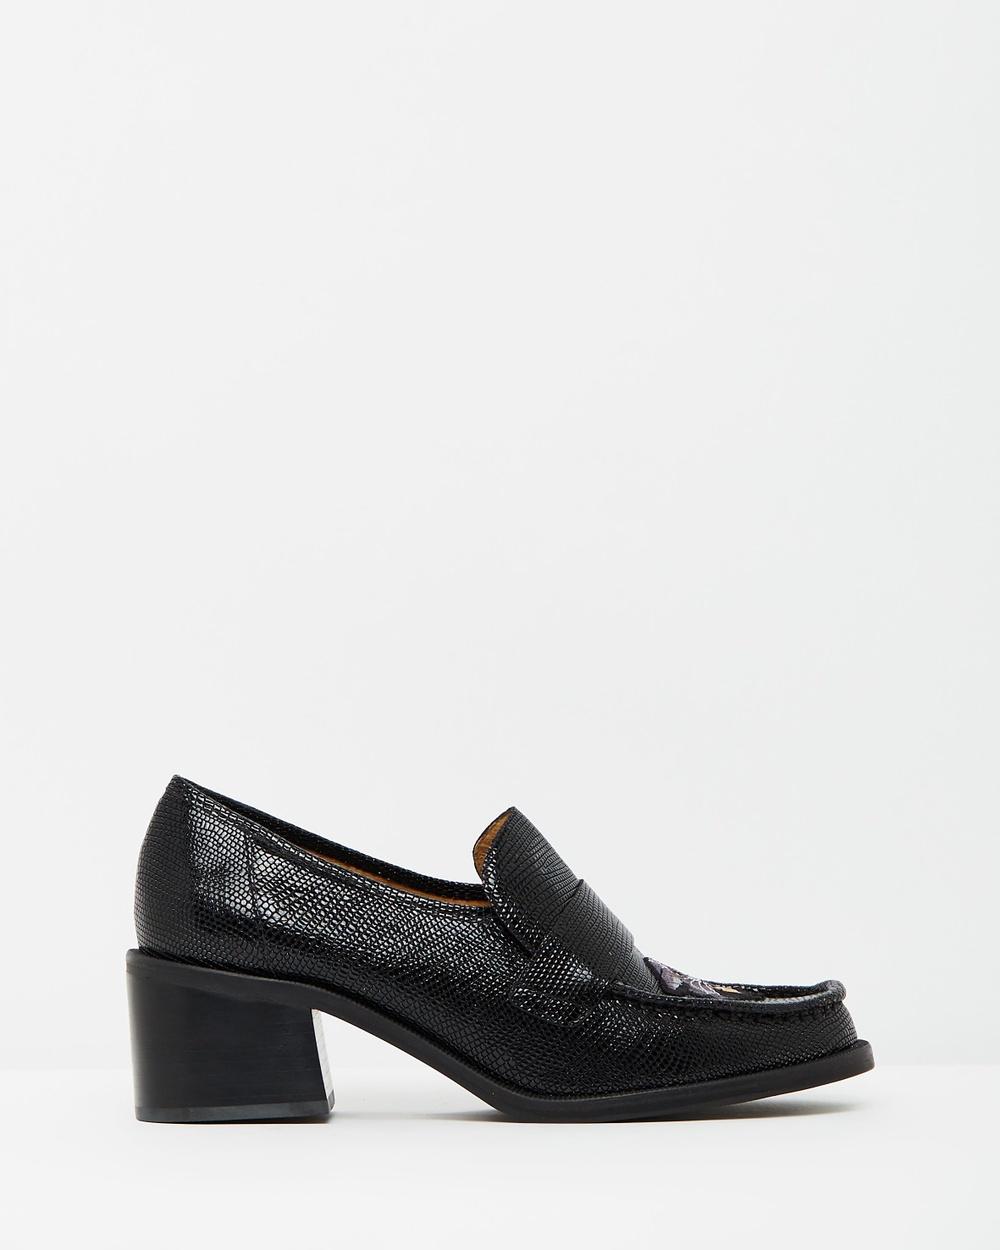 TOPSHOP Krayon Heeled Loafers Mid-low heels Black Krayon Heeled Loafers